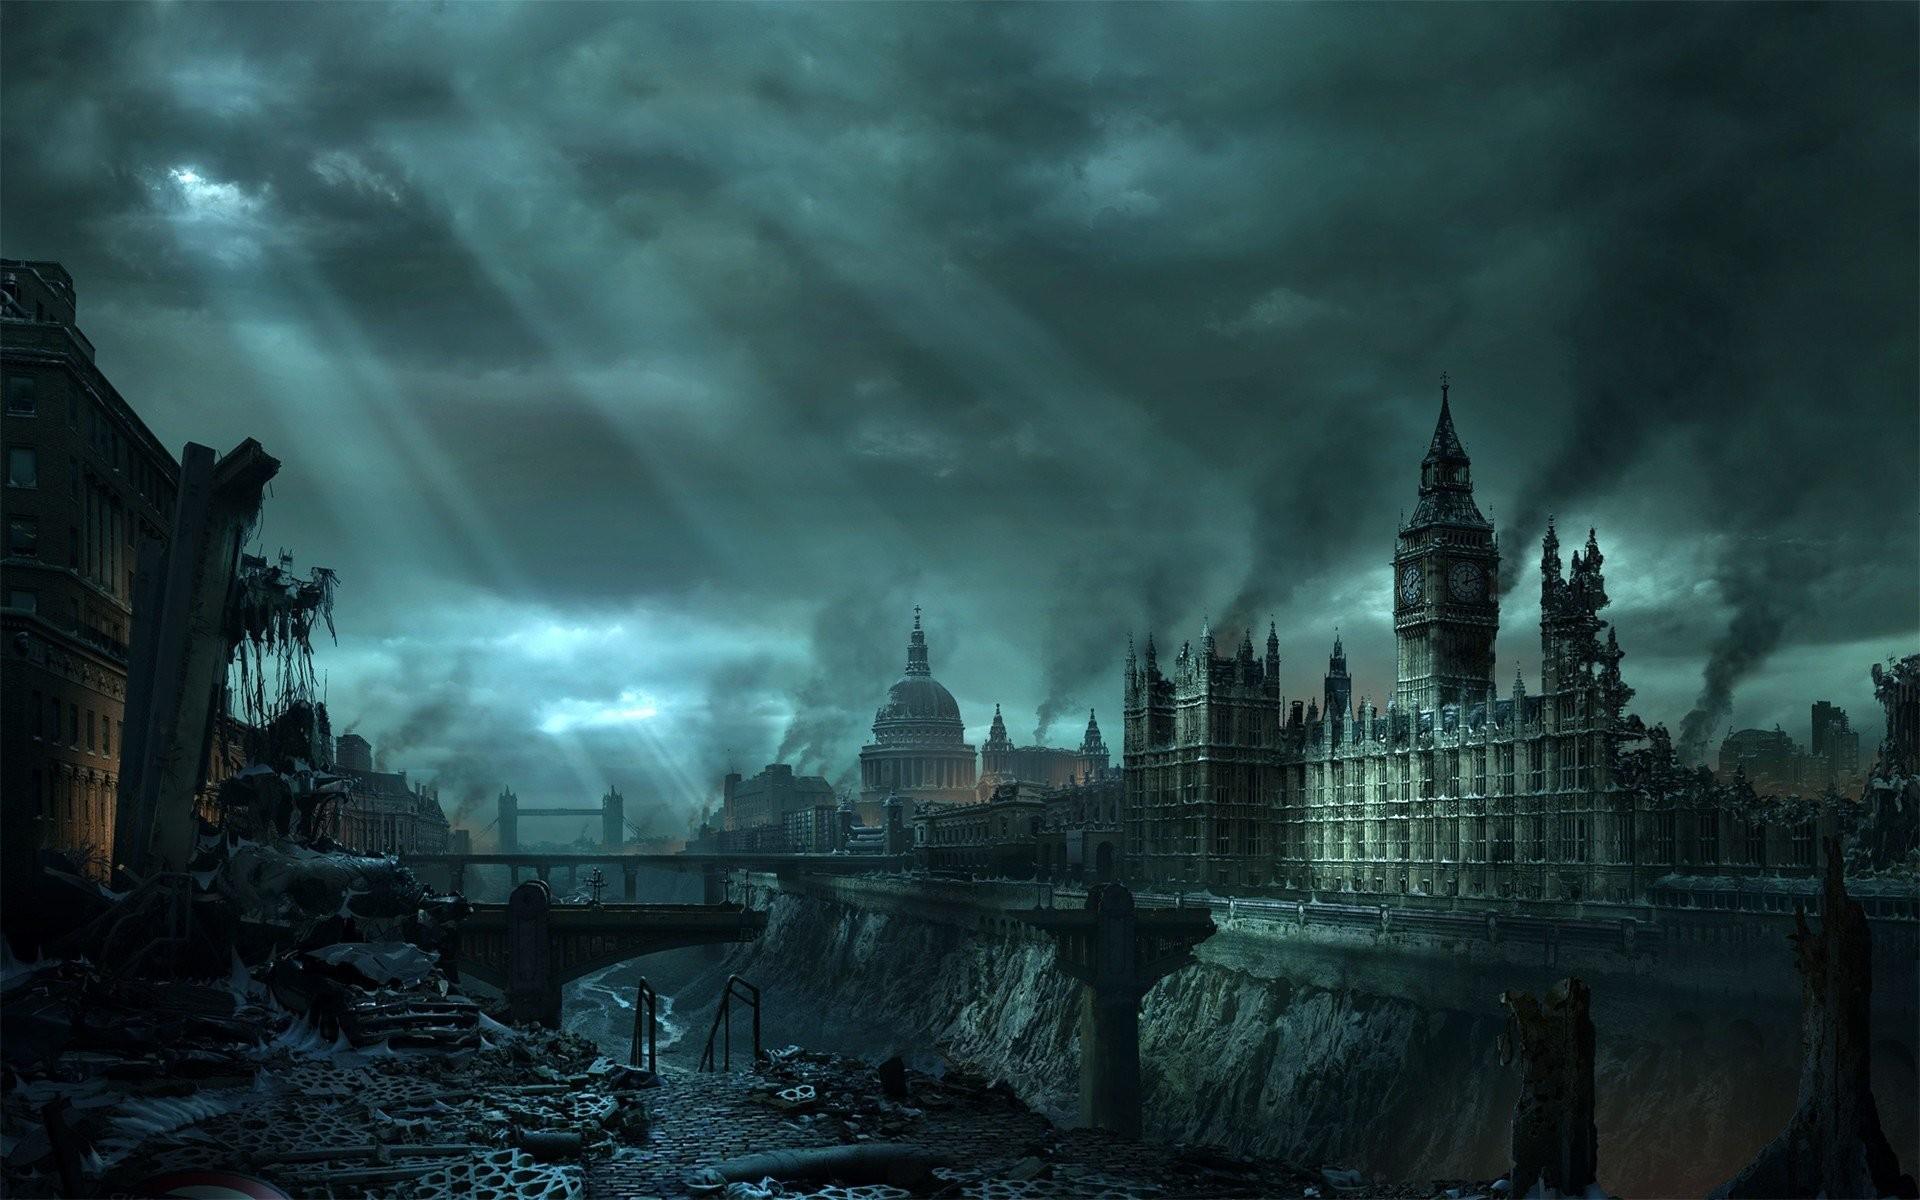 destroyed-london-england-europe-city-destruction-future-fantasy-1920×1200-wallpaper123918.jpg  970×600 pixels   City of Carnal Policy   Pinterest   Hd …